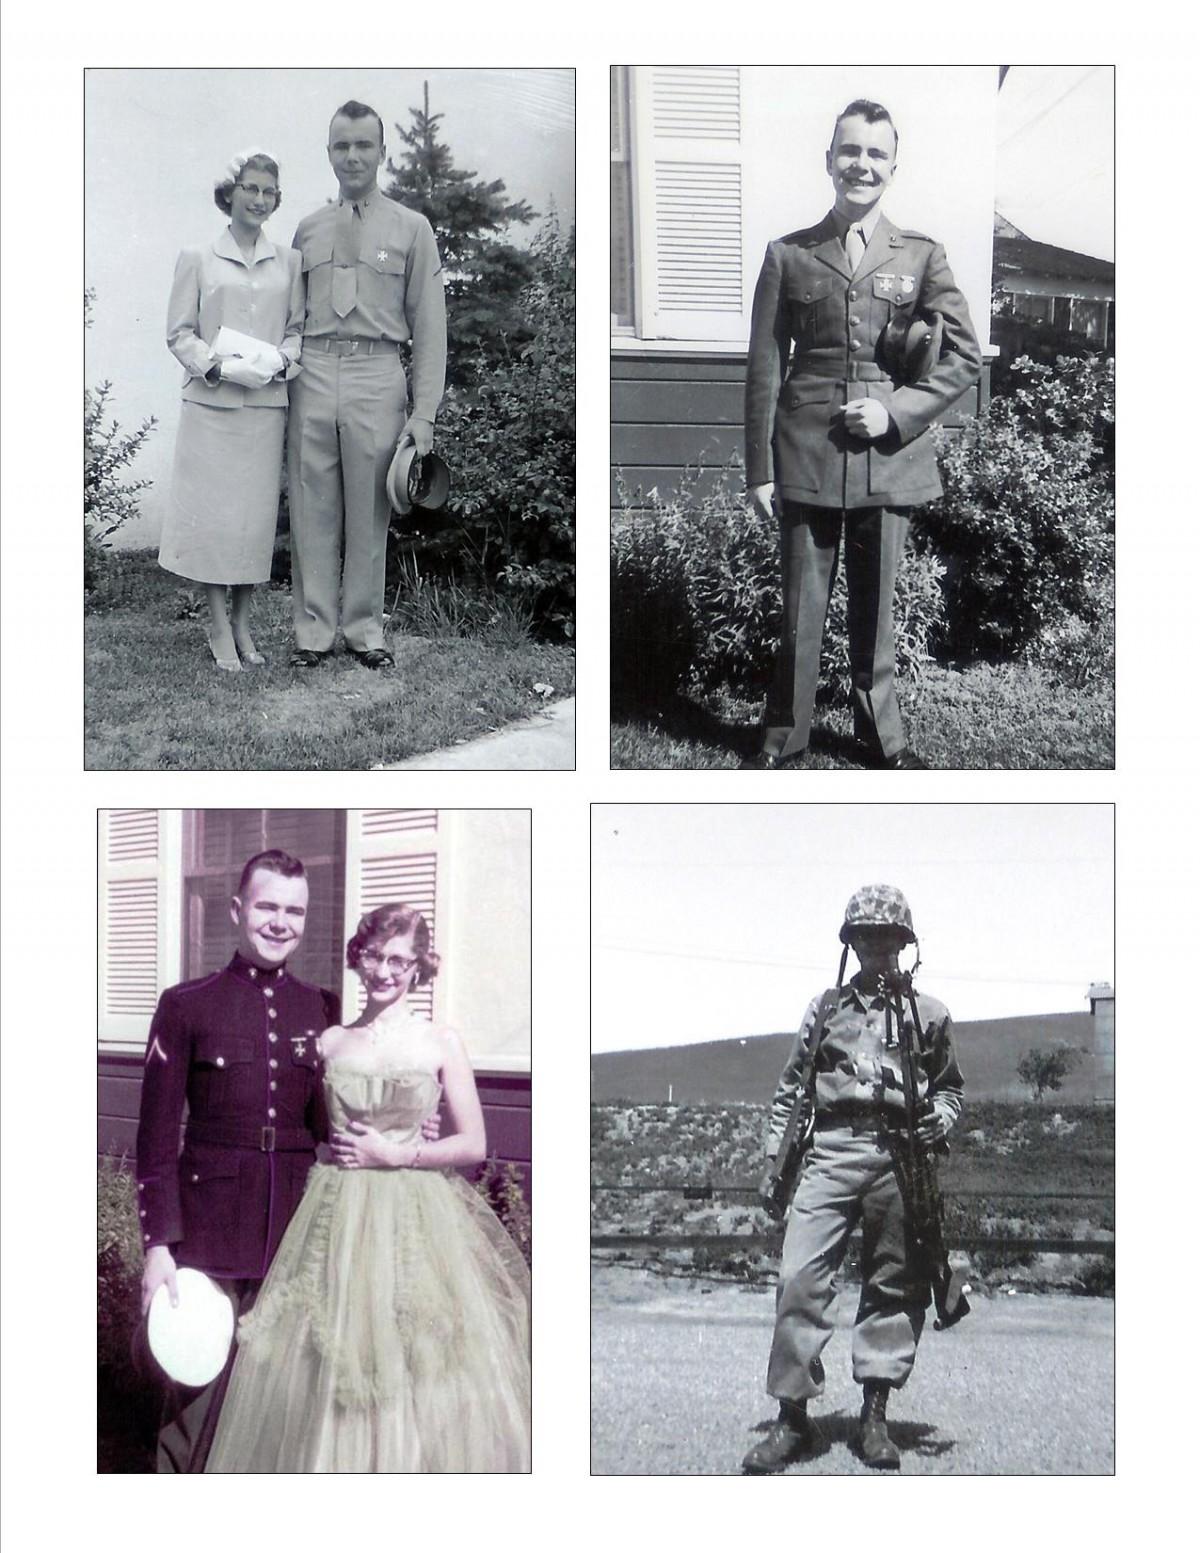 USMC 1955 Uniforms